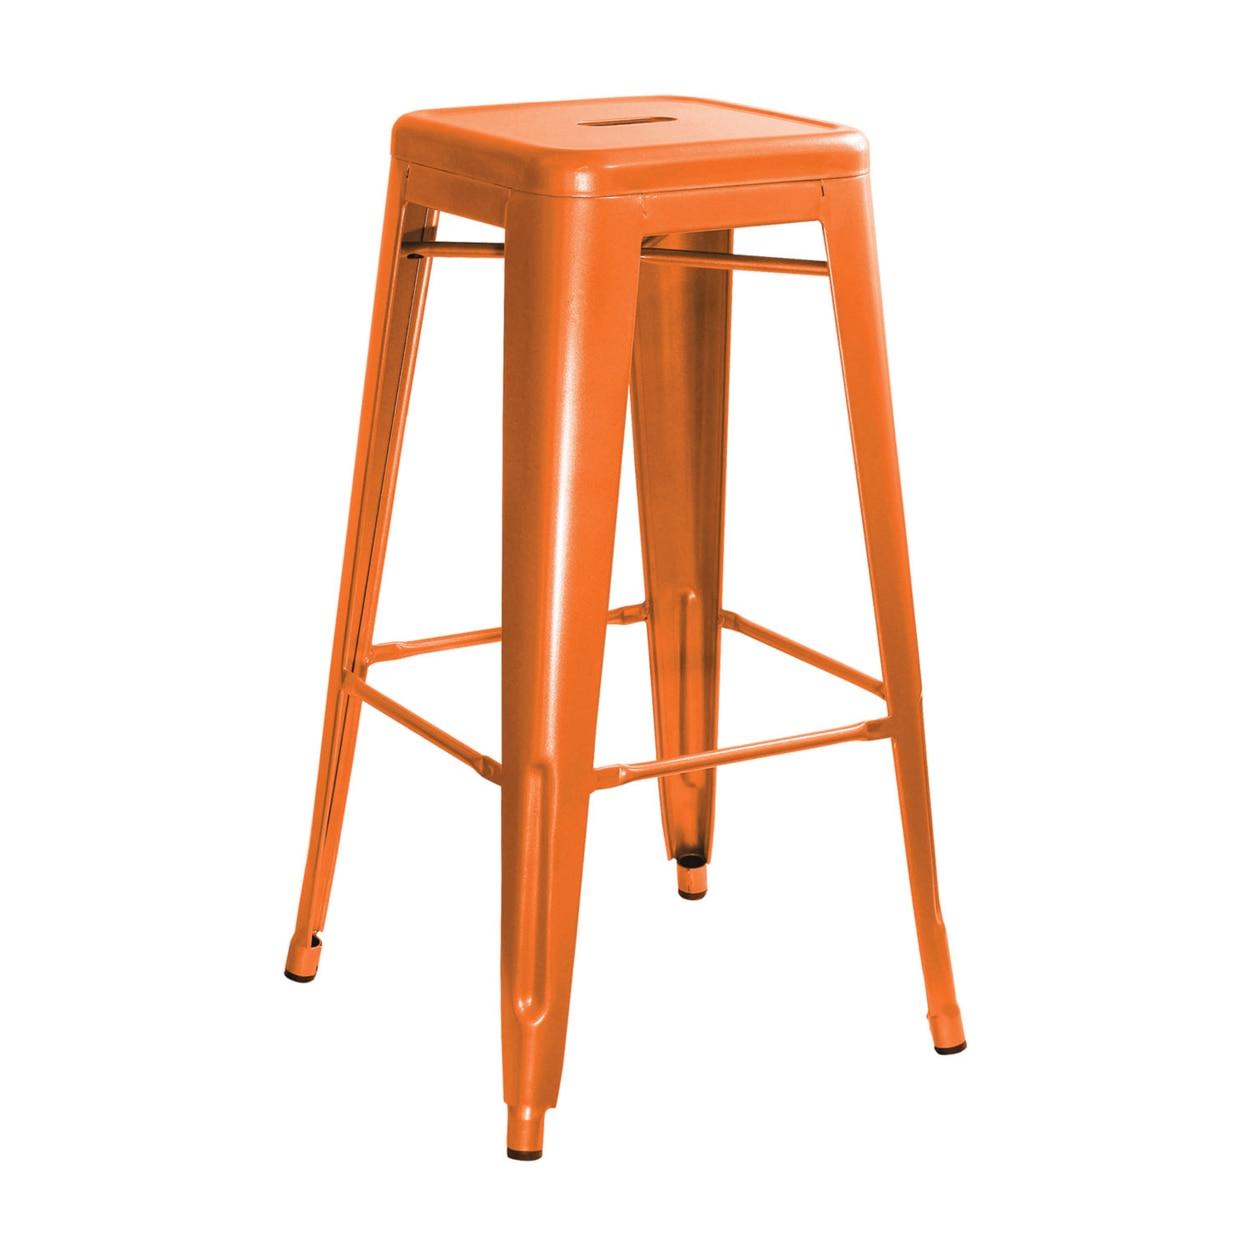 AmeriHome Loft Orange Metal Bar Stool